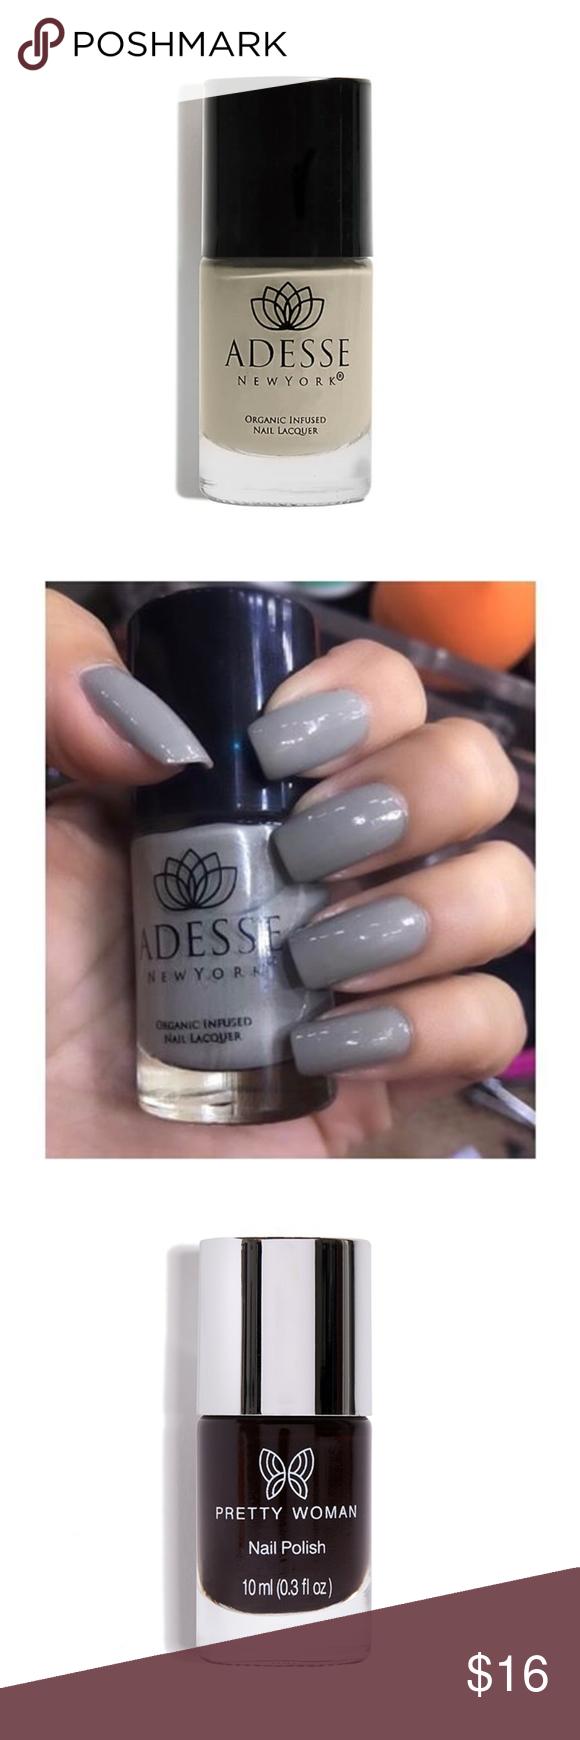 Adesse NY & Pretty Woman Vegan Nail Polish Bundle | Pinterest